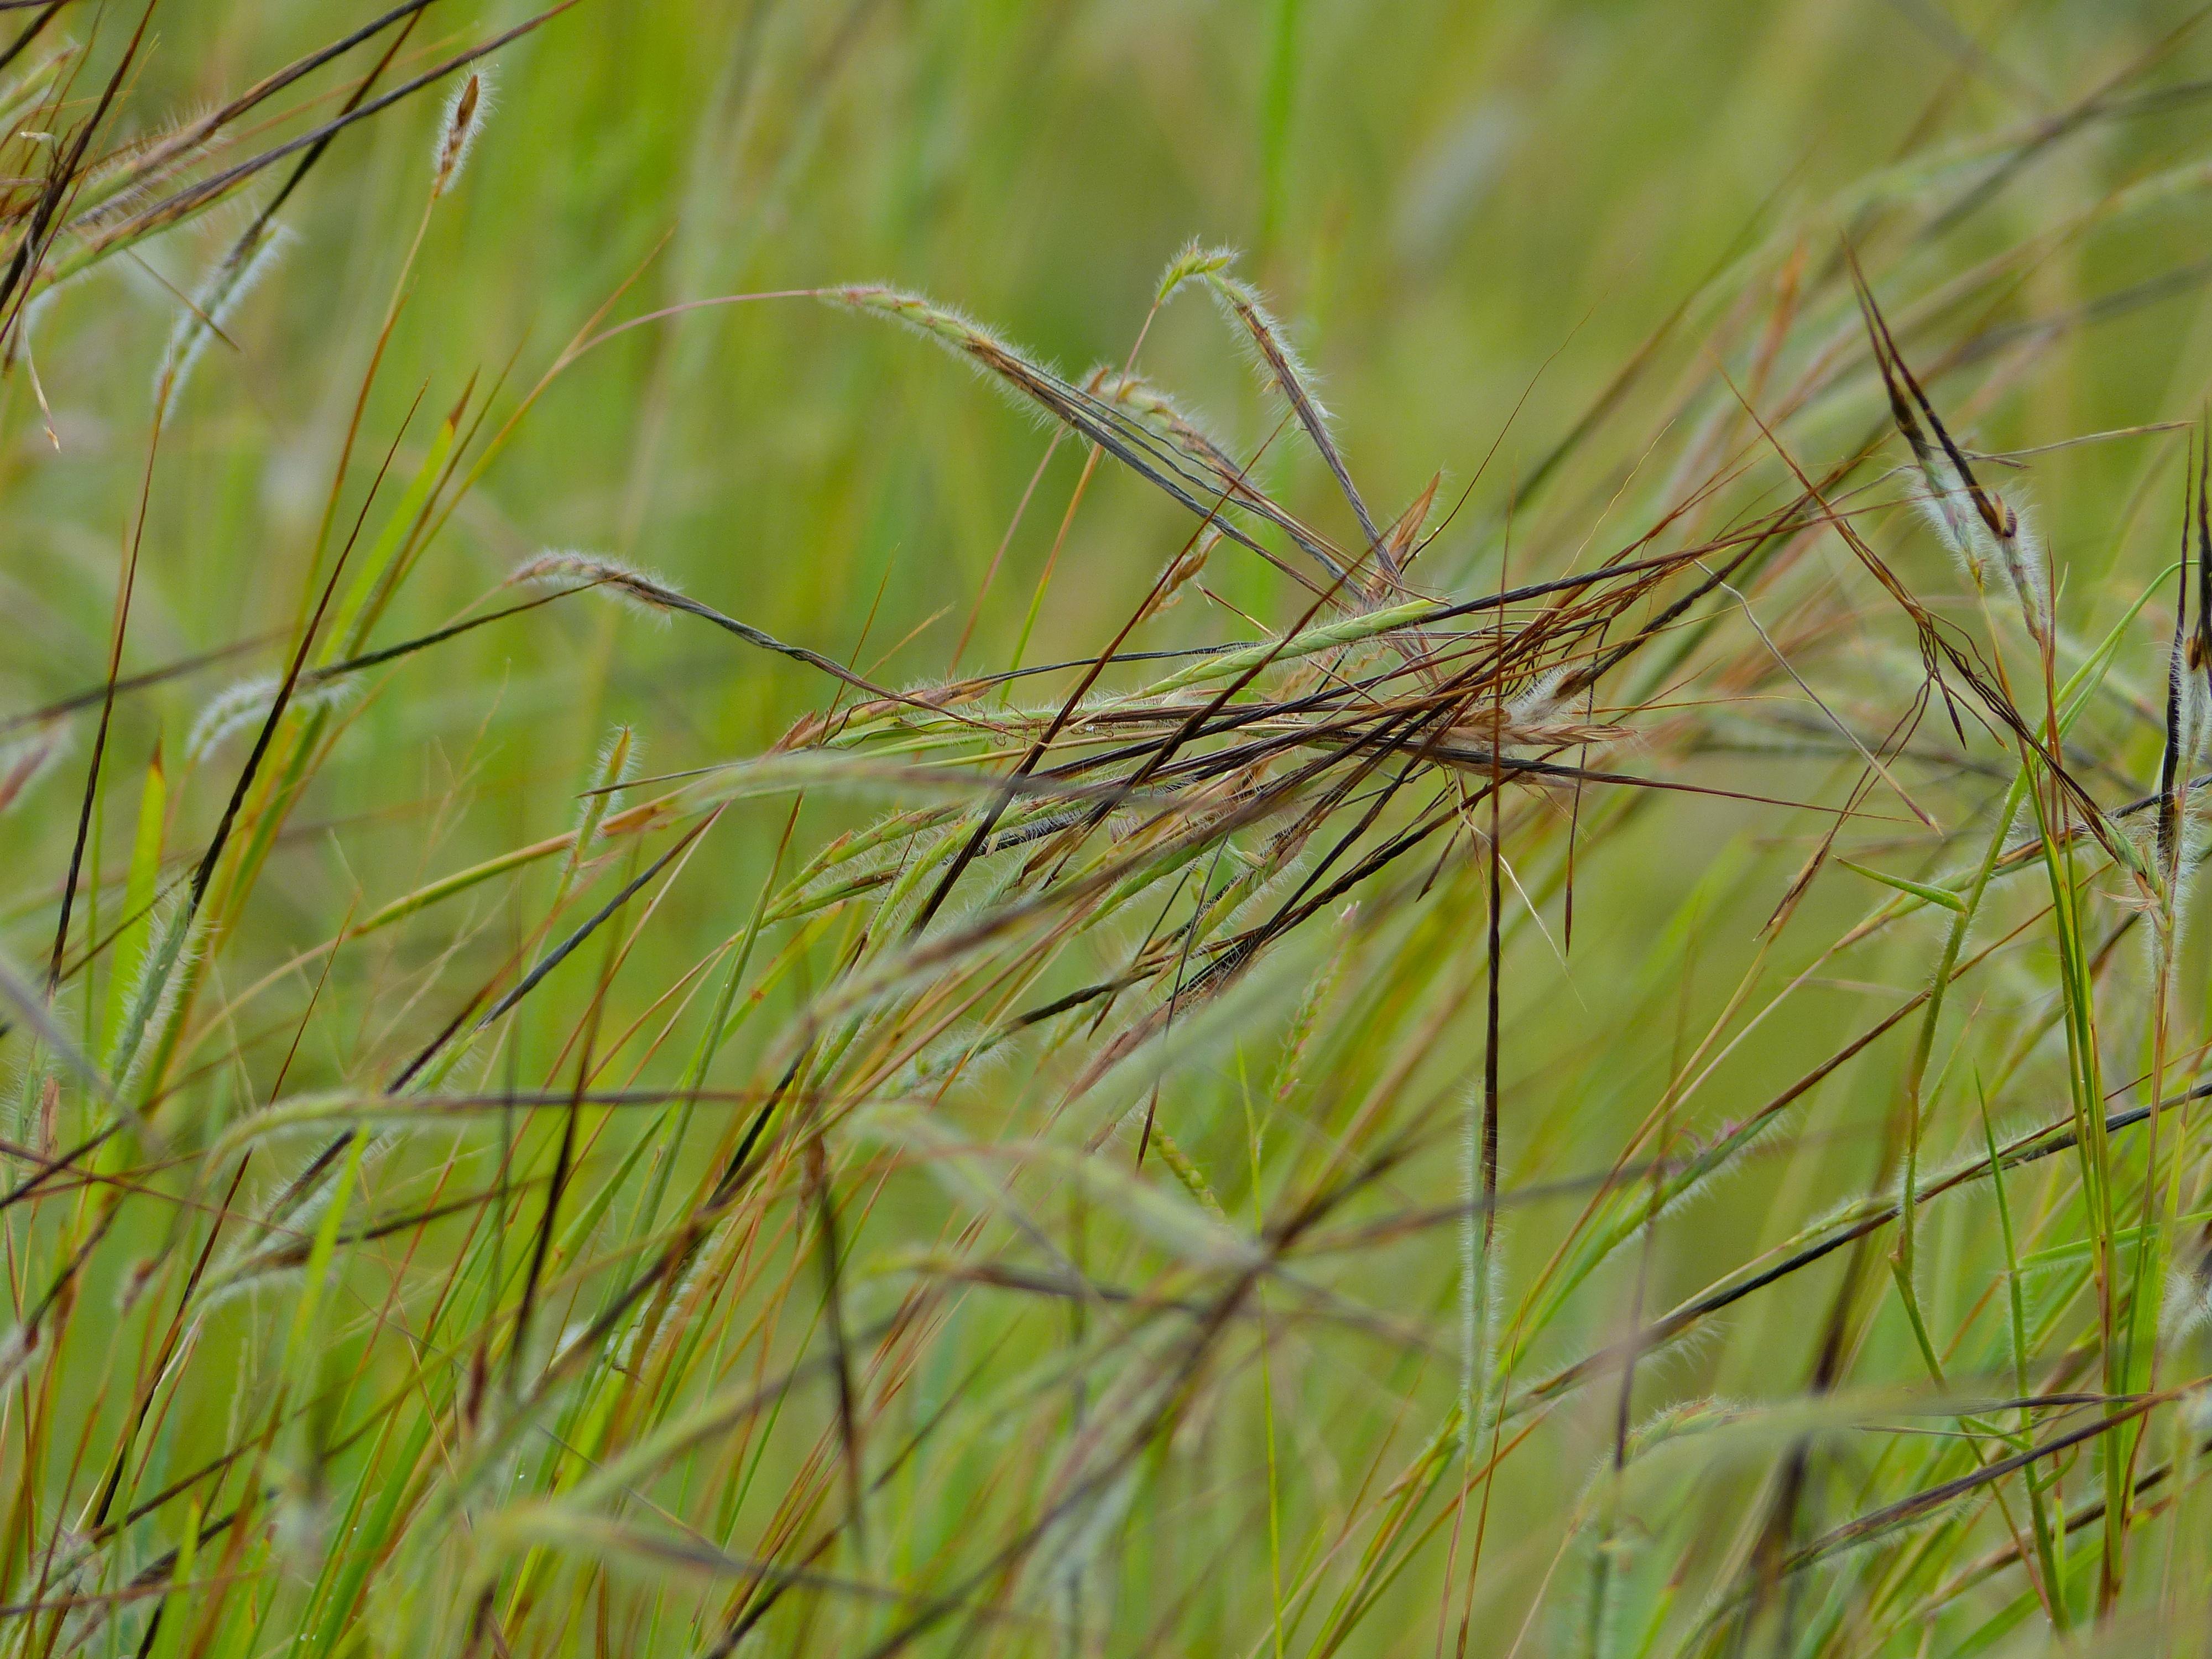 file spear grass  heteropogon contortus  intertwined awns  12818793383  jpg